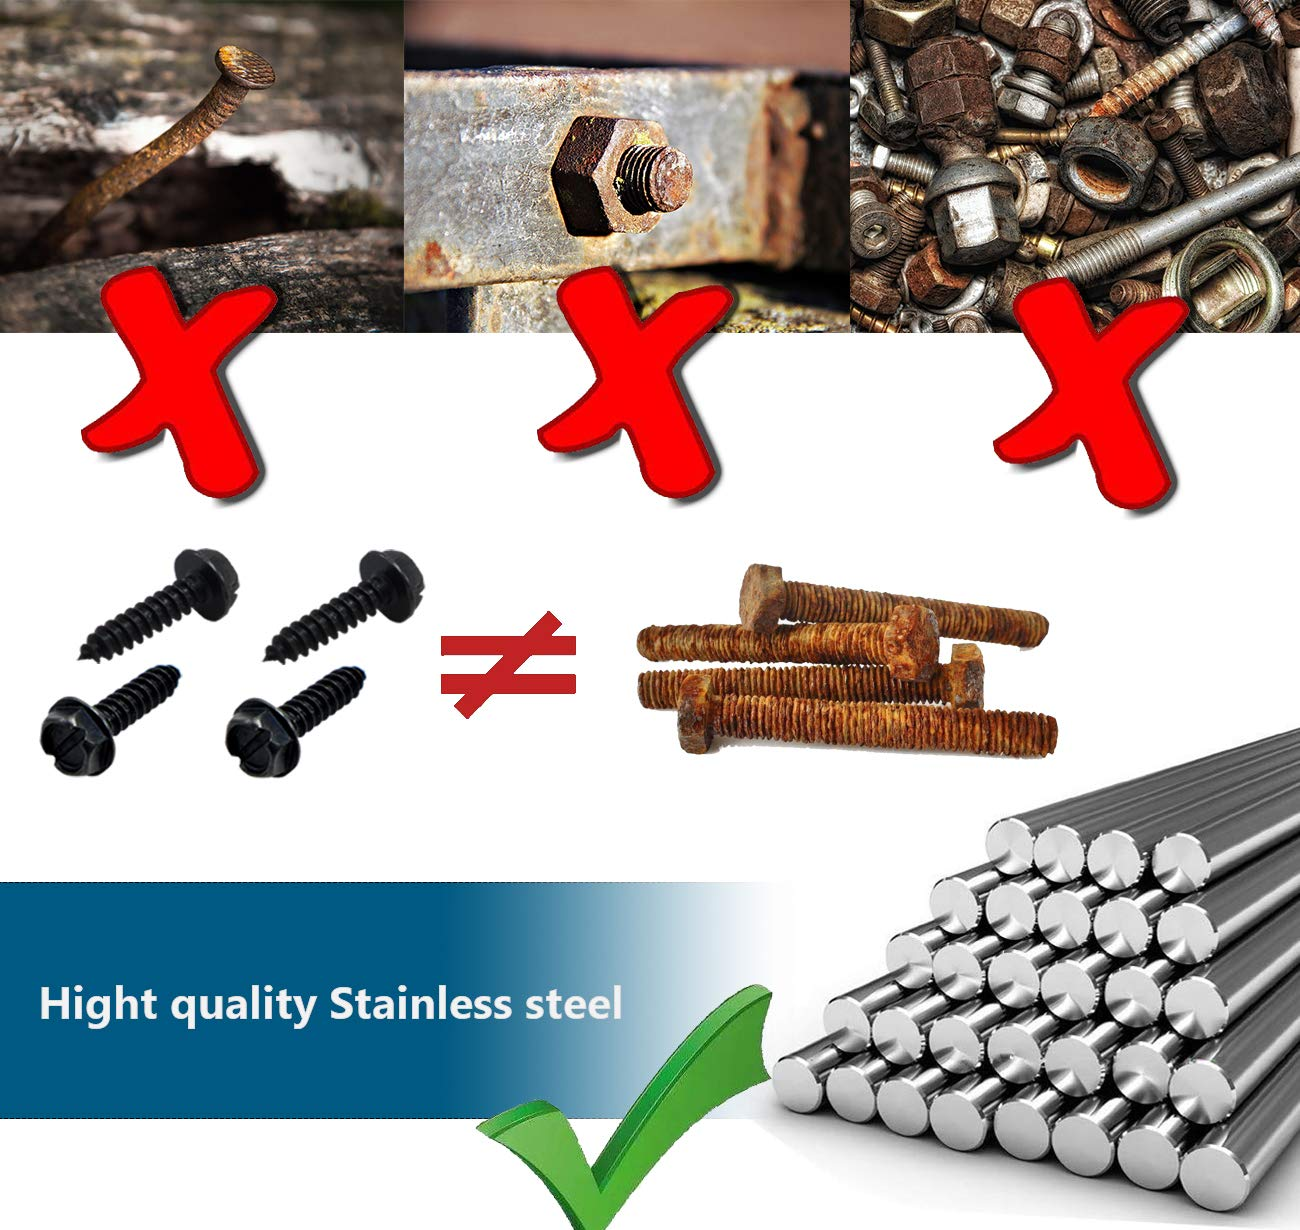 Black CASAON 16pcs License Plate Screws Black Coated Iron Screws for Fastening License Plates